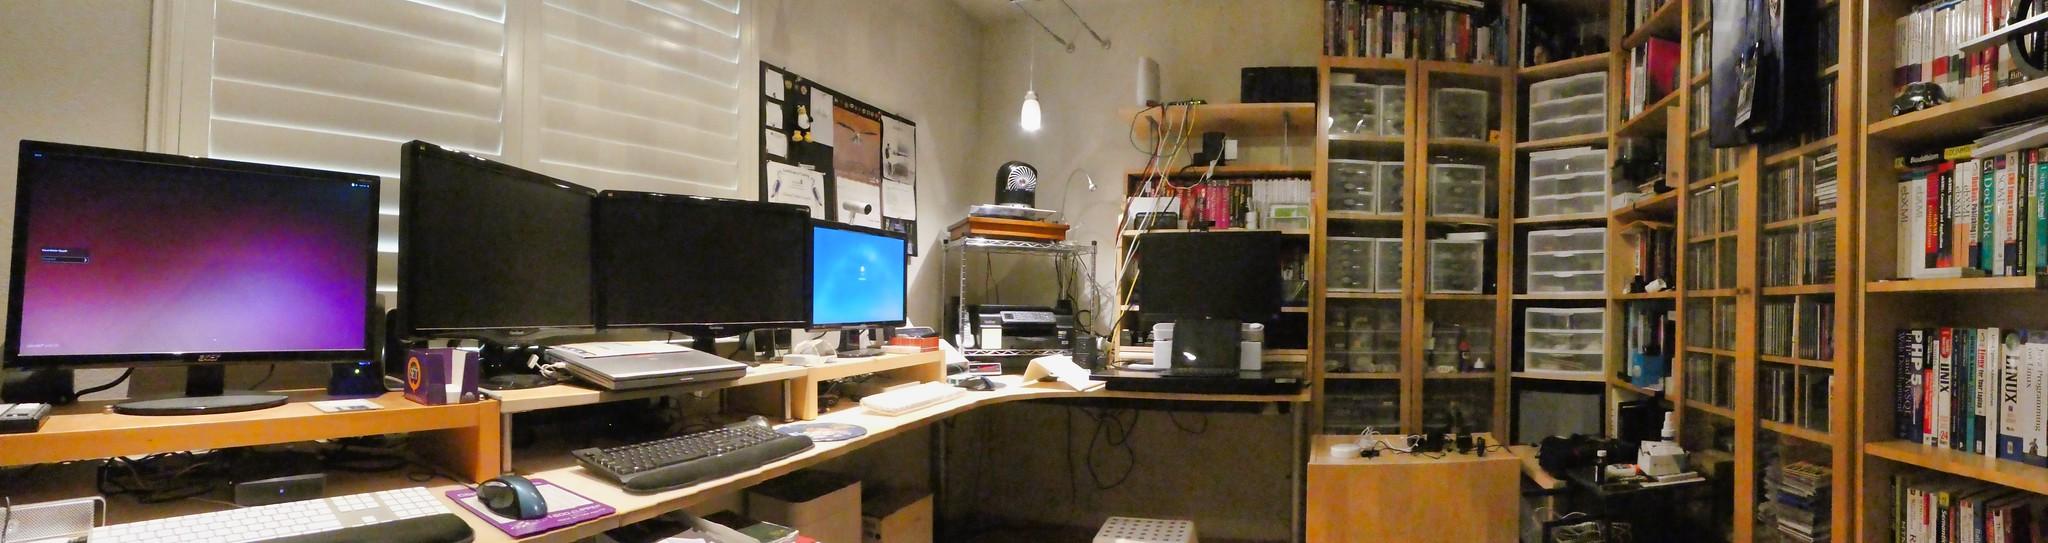 2020-03-18 Minimizing my Office (1/8)